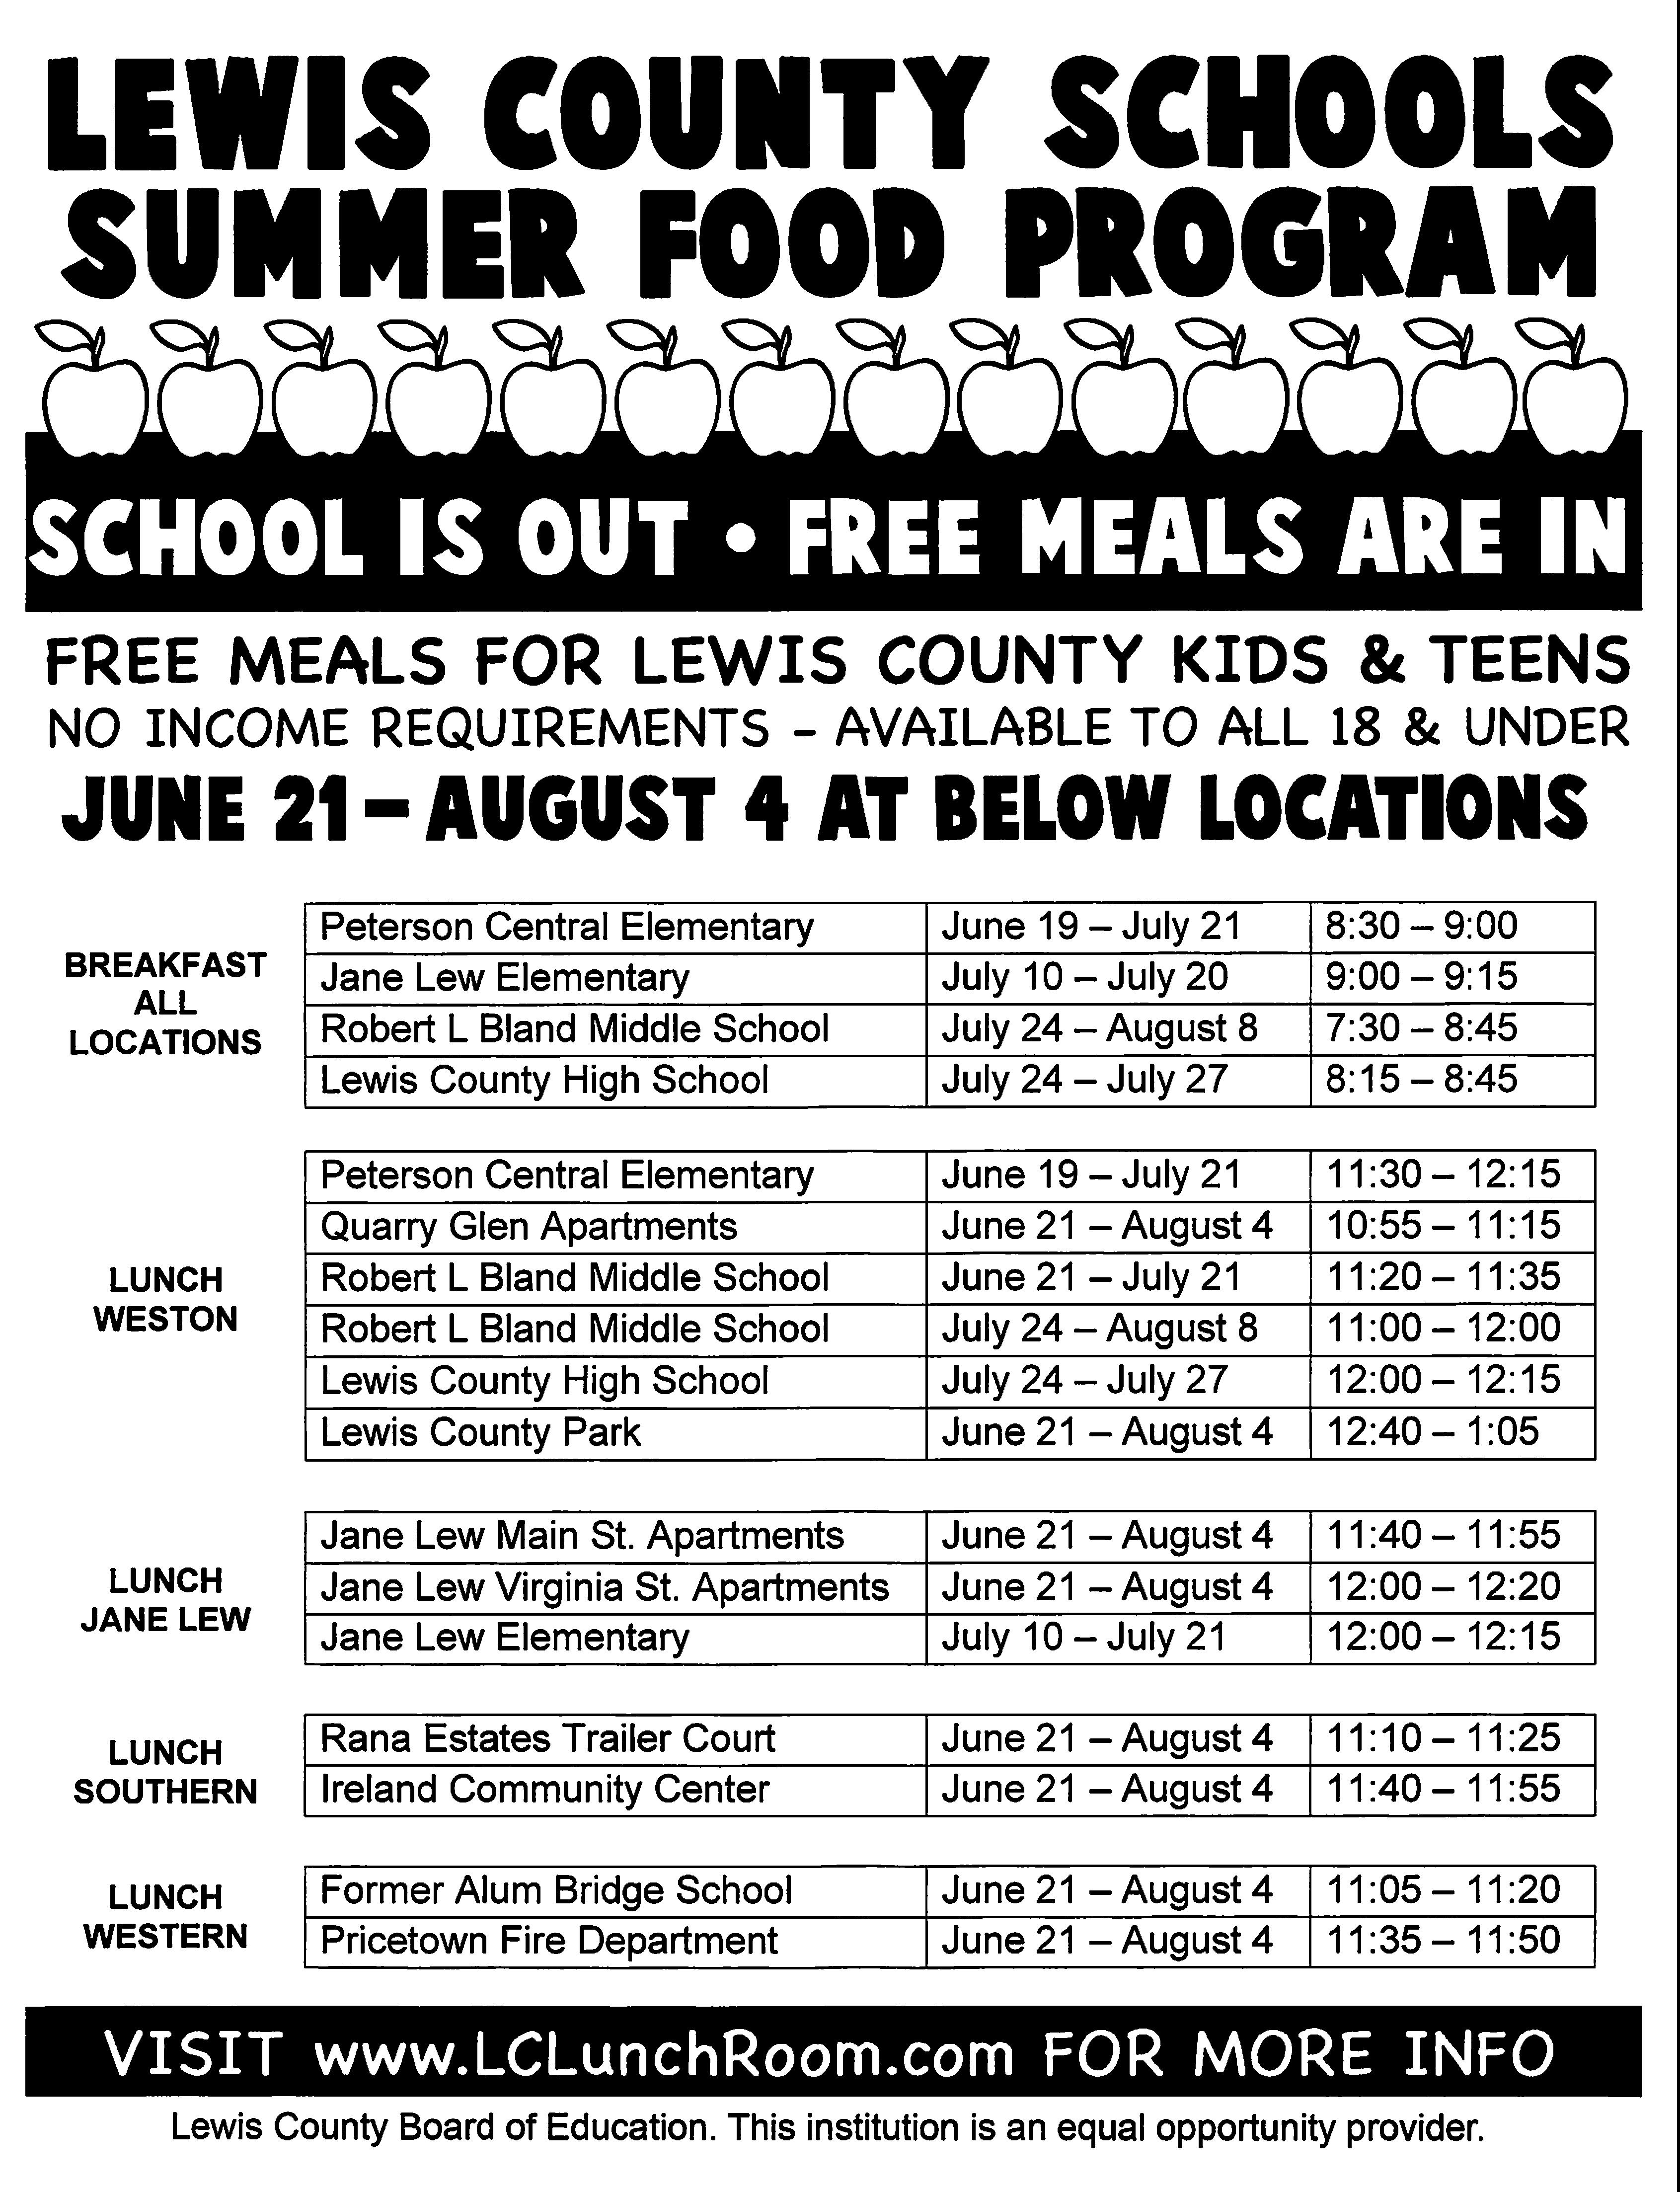 LC_Summer_Food_2017_Schedule.jpg